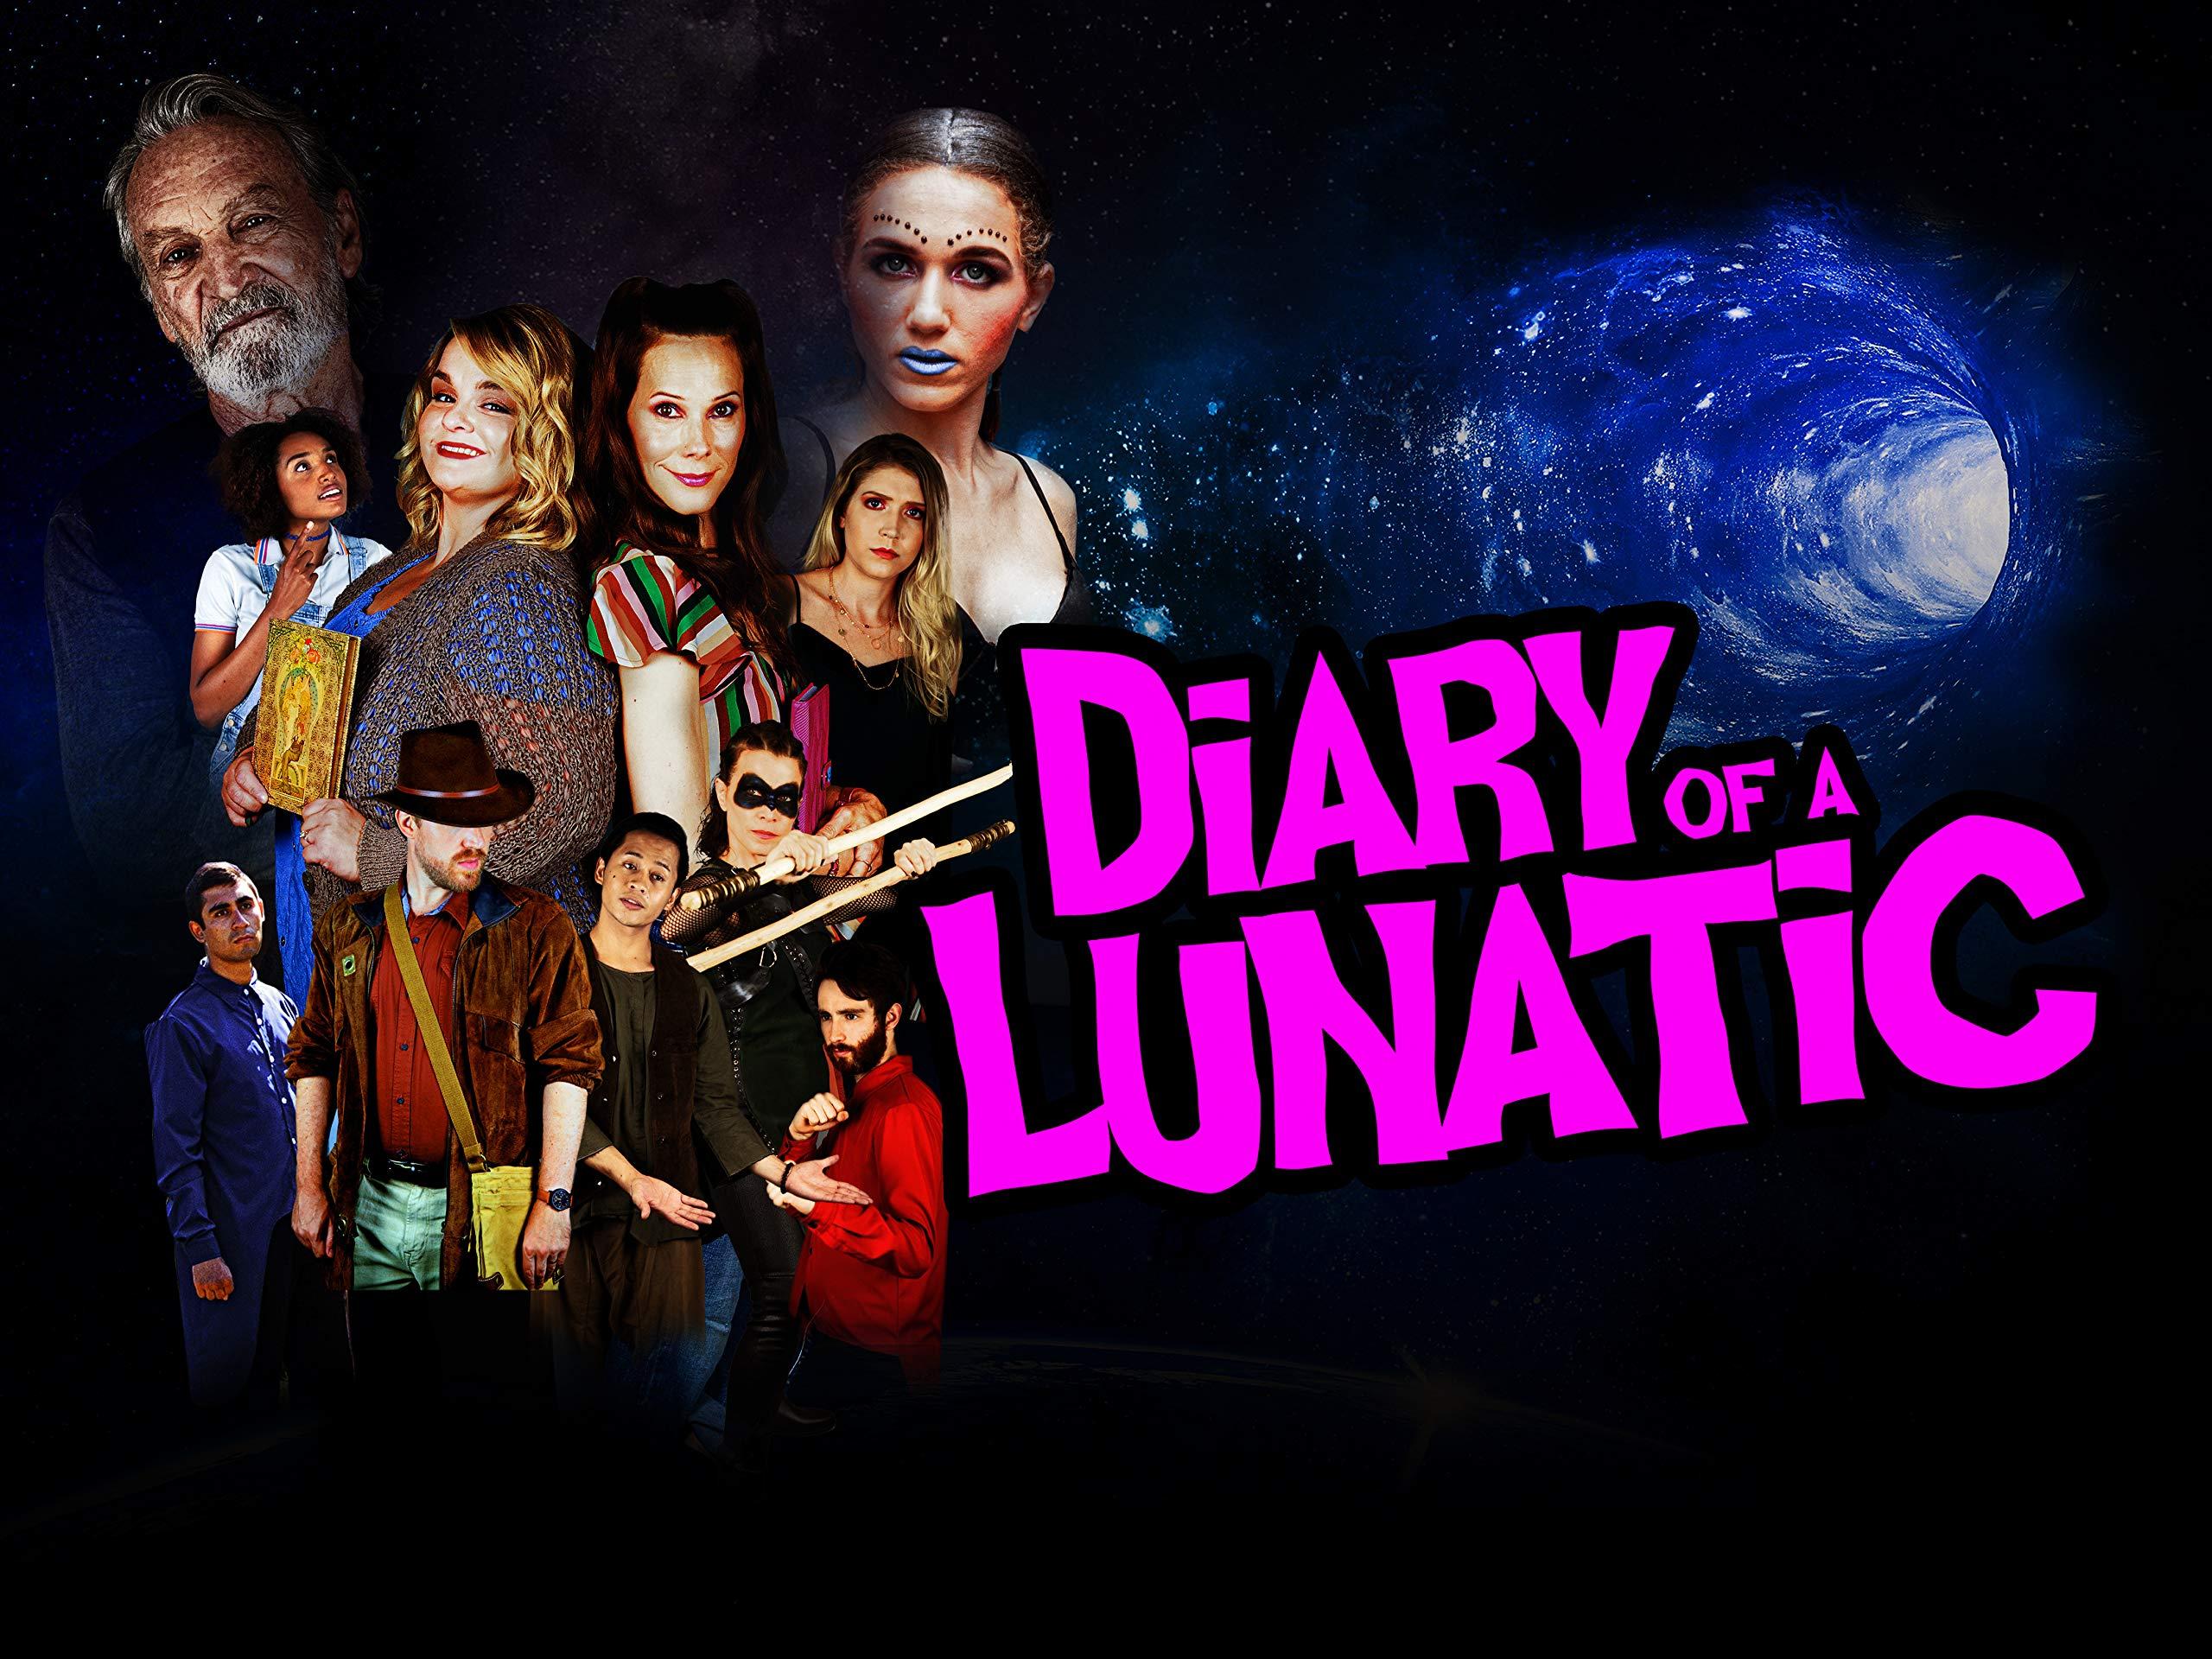 Diary of a Lunatic - Season 1